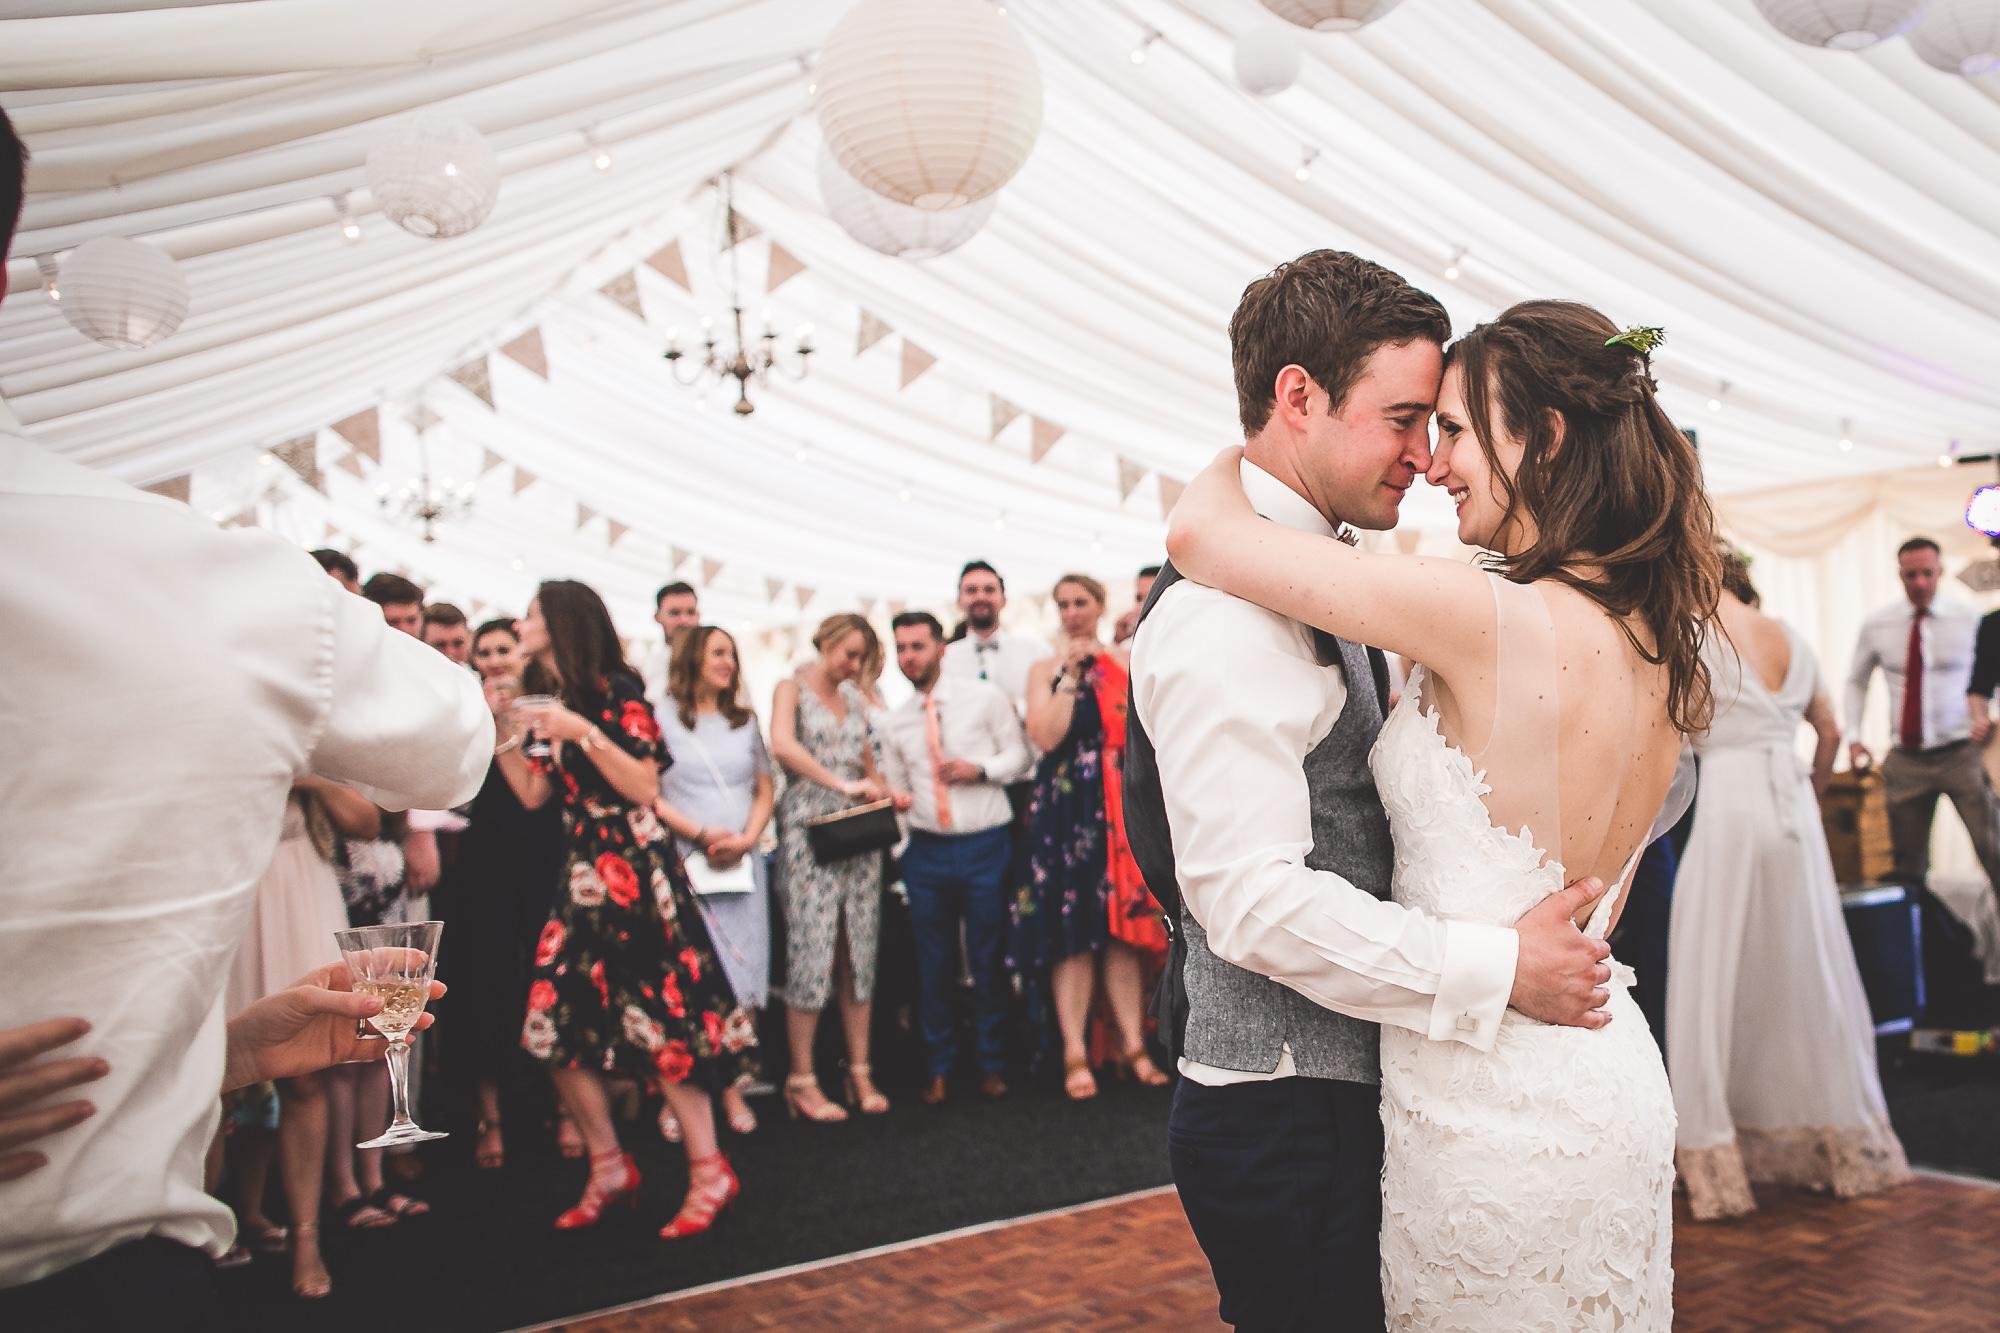 Veils & Bales Wedding Photography | Charlie & Steve SCSS 257